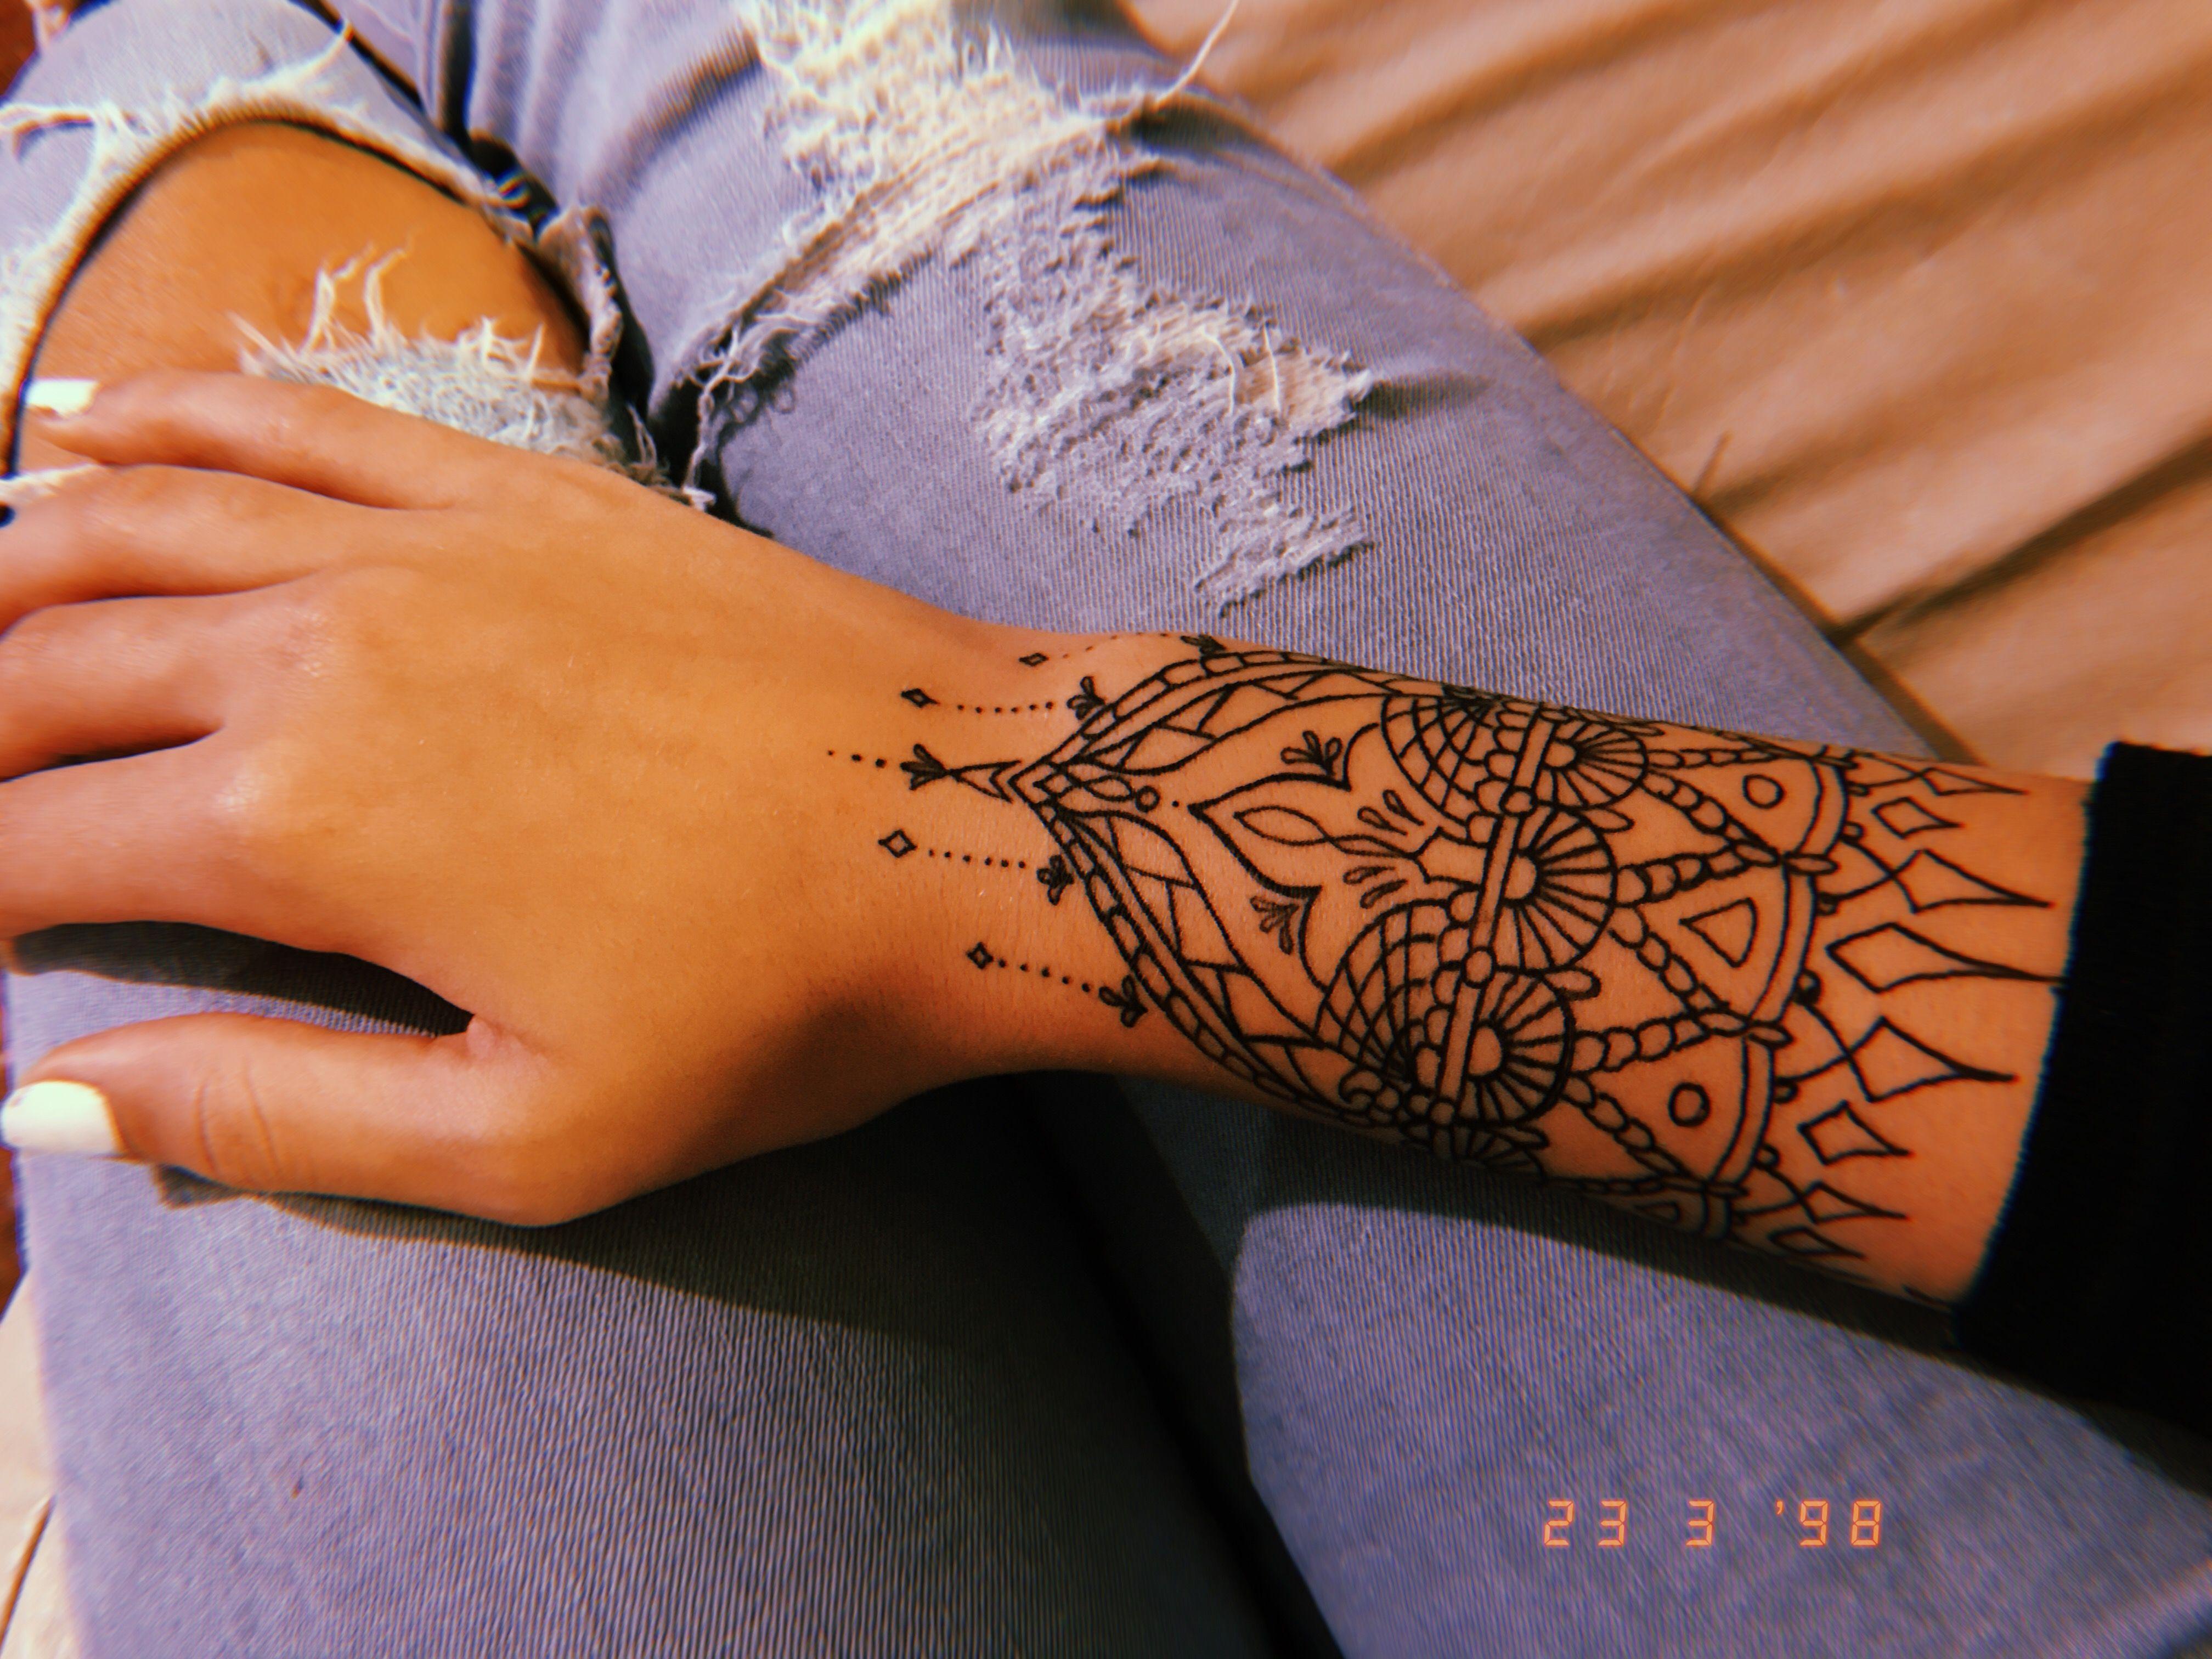 Wrist Mandala Tattoo Desenhos Tatuagem No Tornozelo Tatuagem Bracelete Feminino Modelo Tatuagem